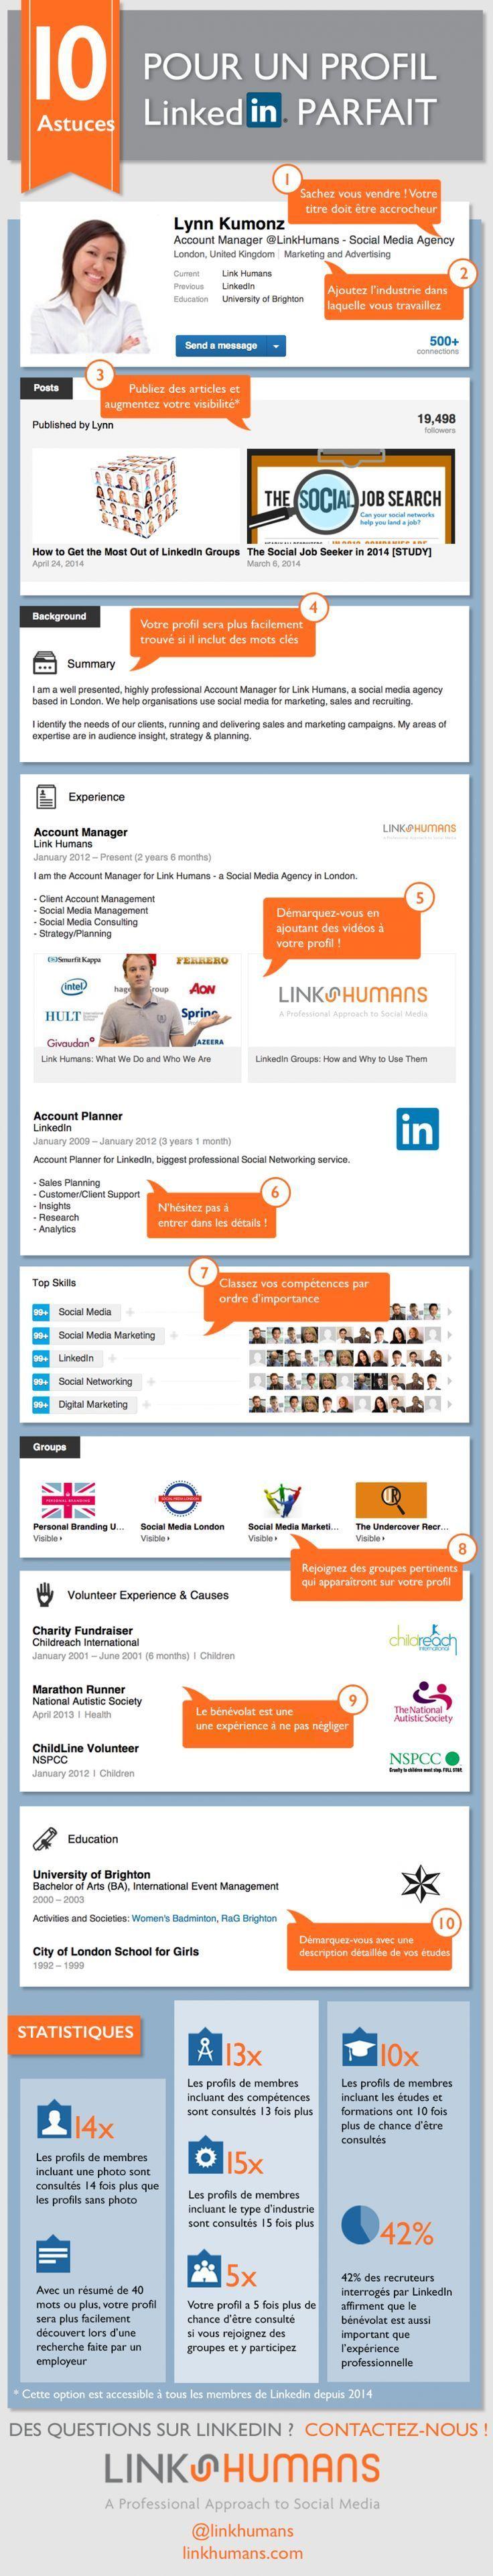 infographie d u0026 39 un bon profil linkedin